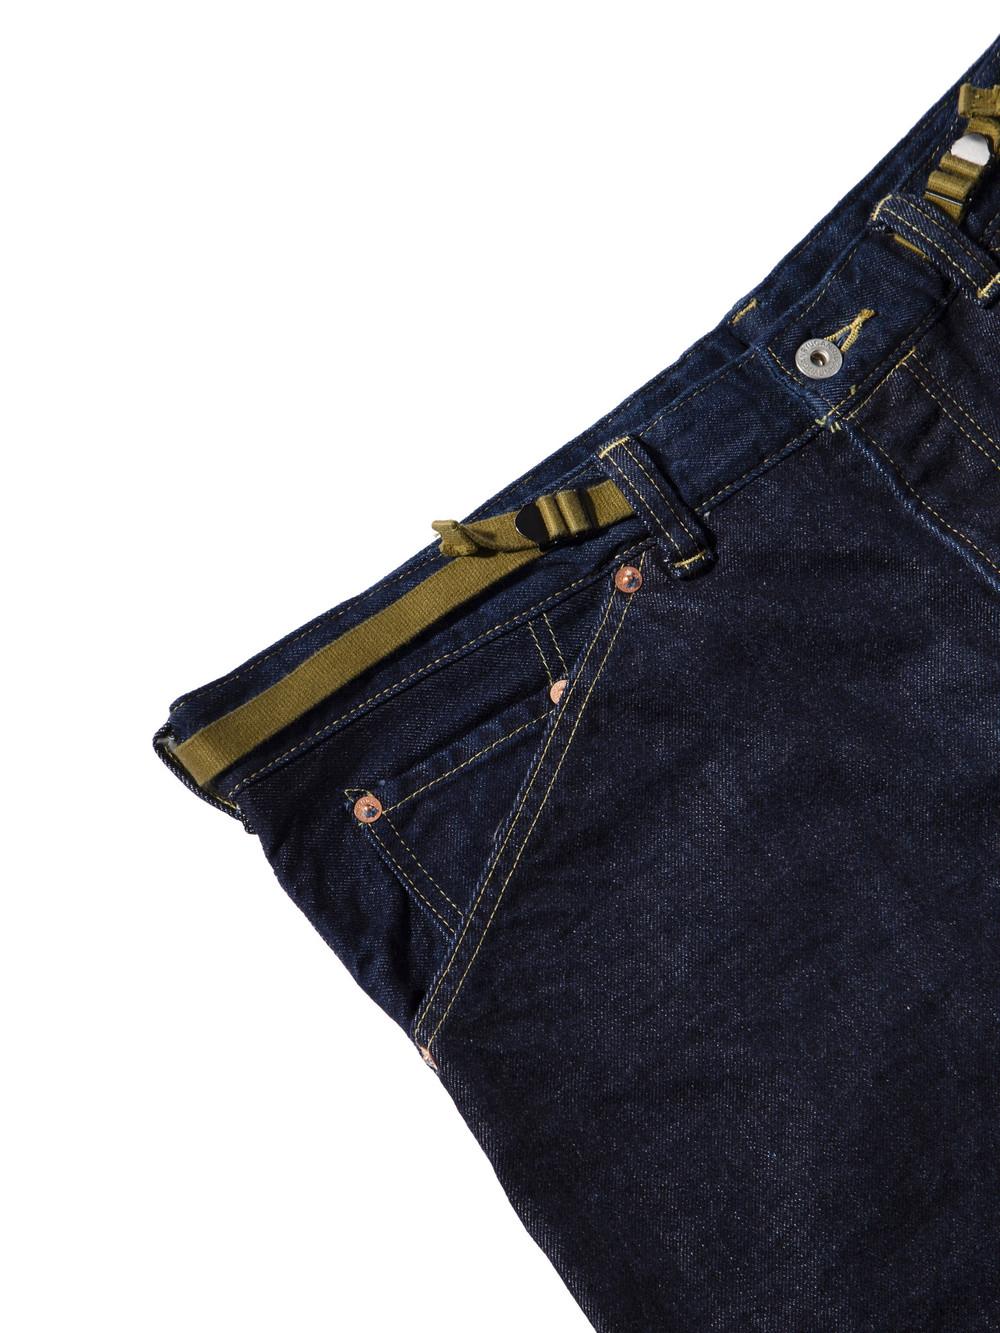 GANRYU_Slouch_Denim_Jeans-3.jpg